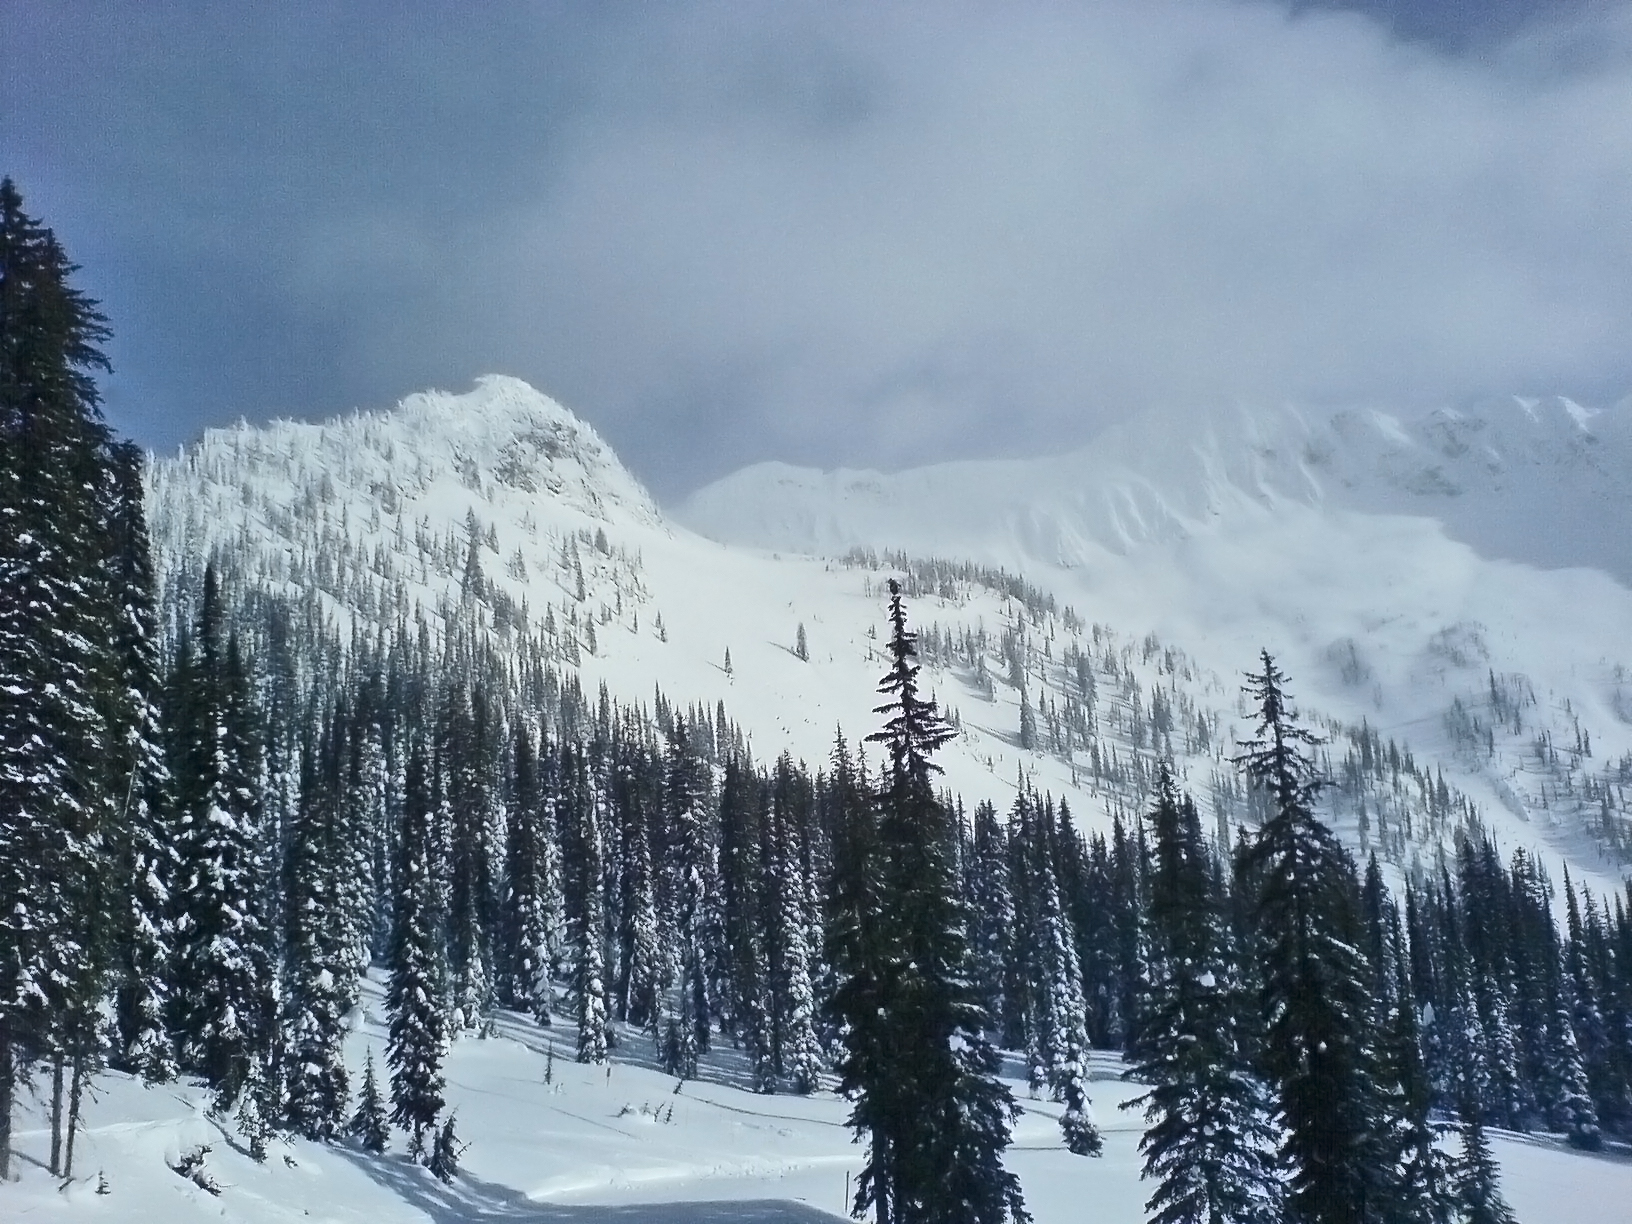 whitewater ski resort - wikipedia